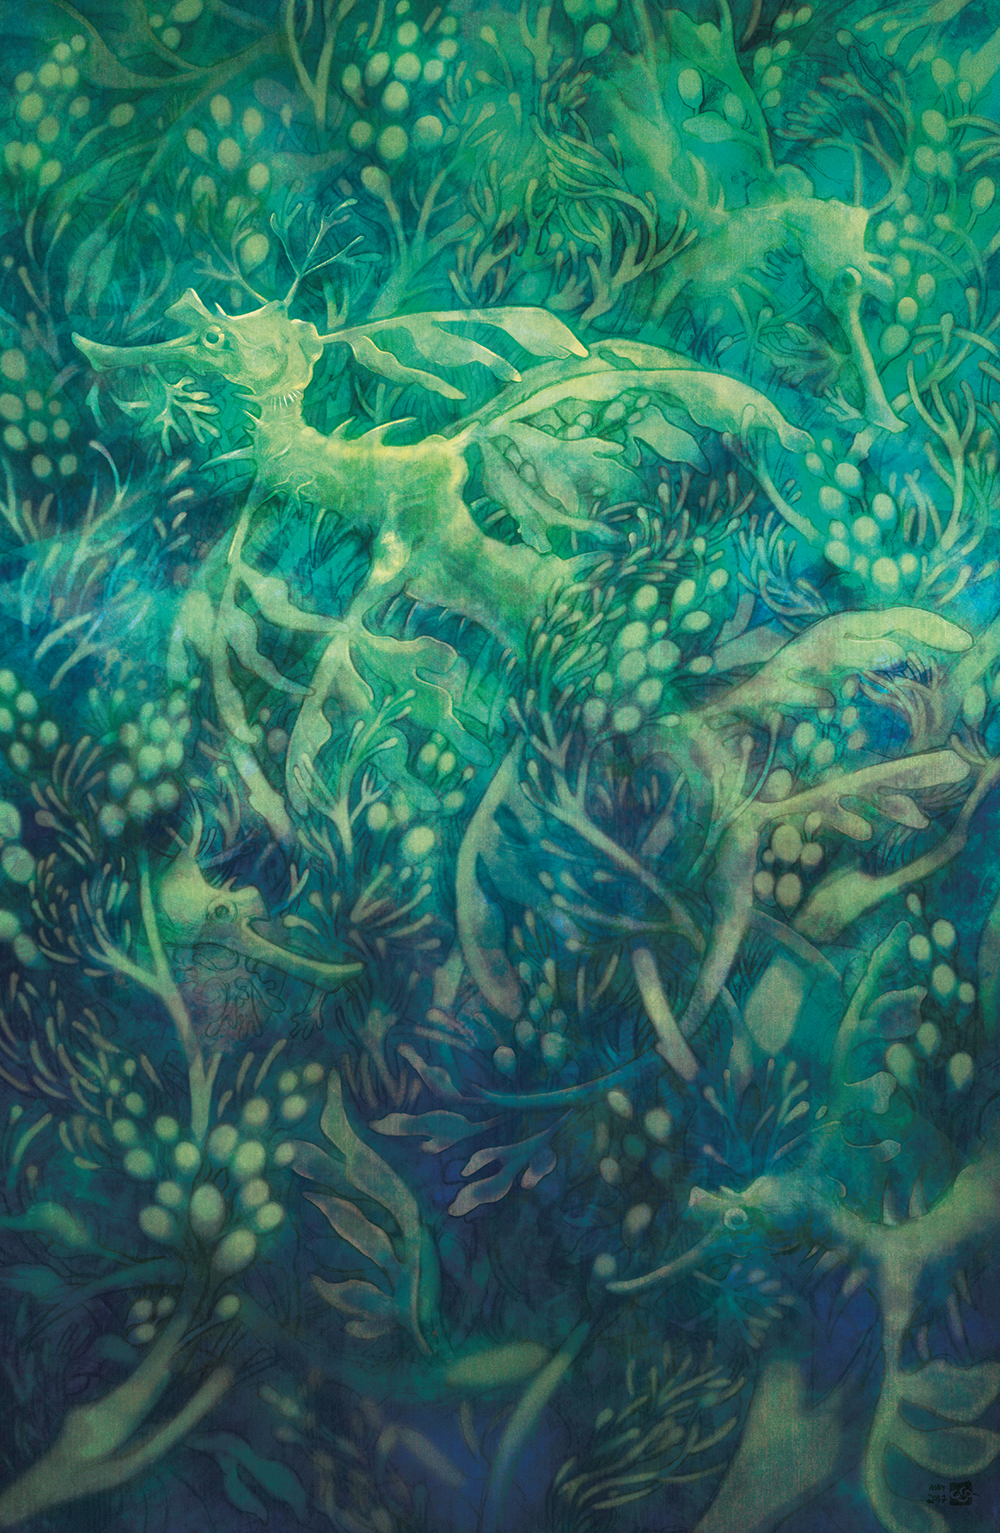 """Leafy Sea Dragon"" by Caitlin Ono"